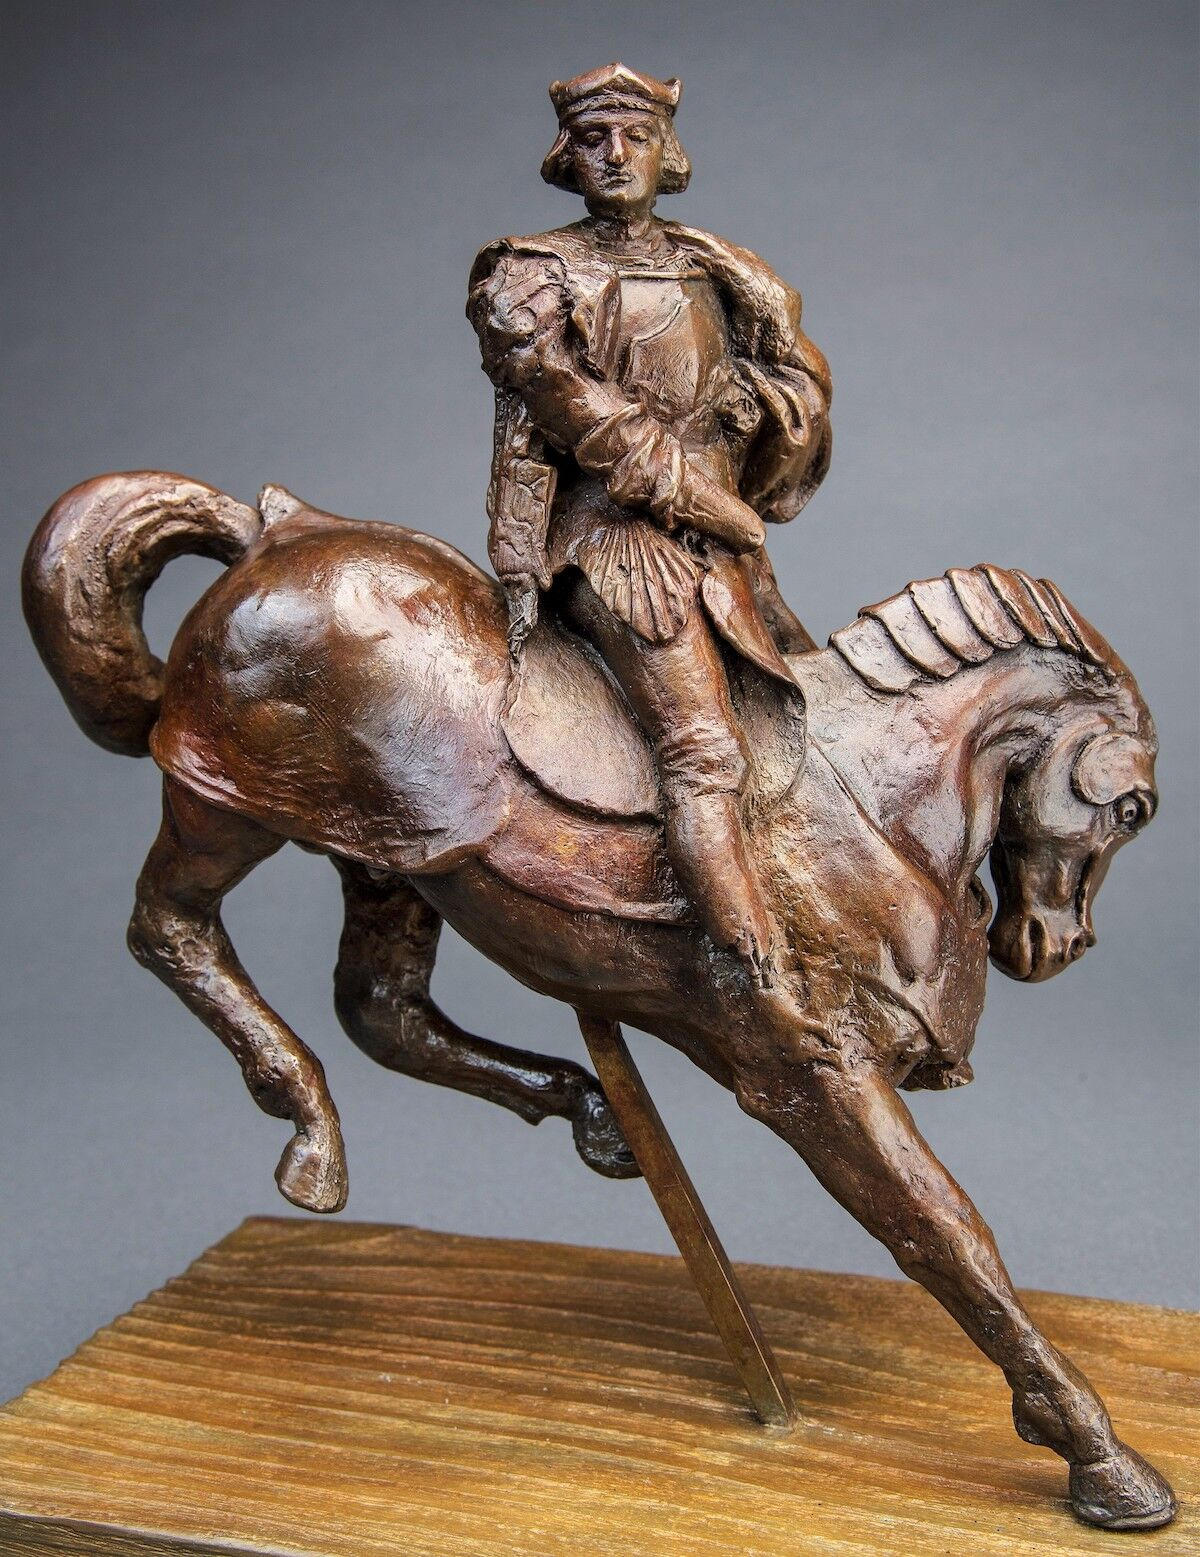 Horse and Rider, a sculpture attributed to Leonardo da Vinci. Courtesy Guernsey's.